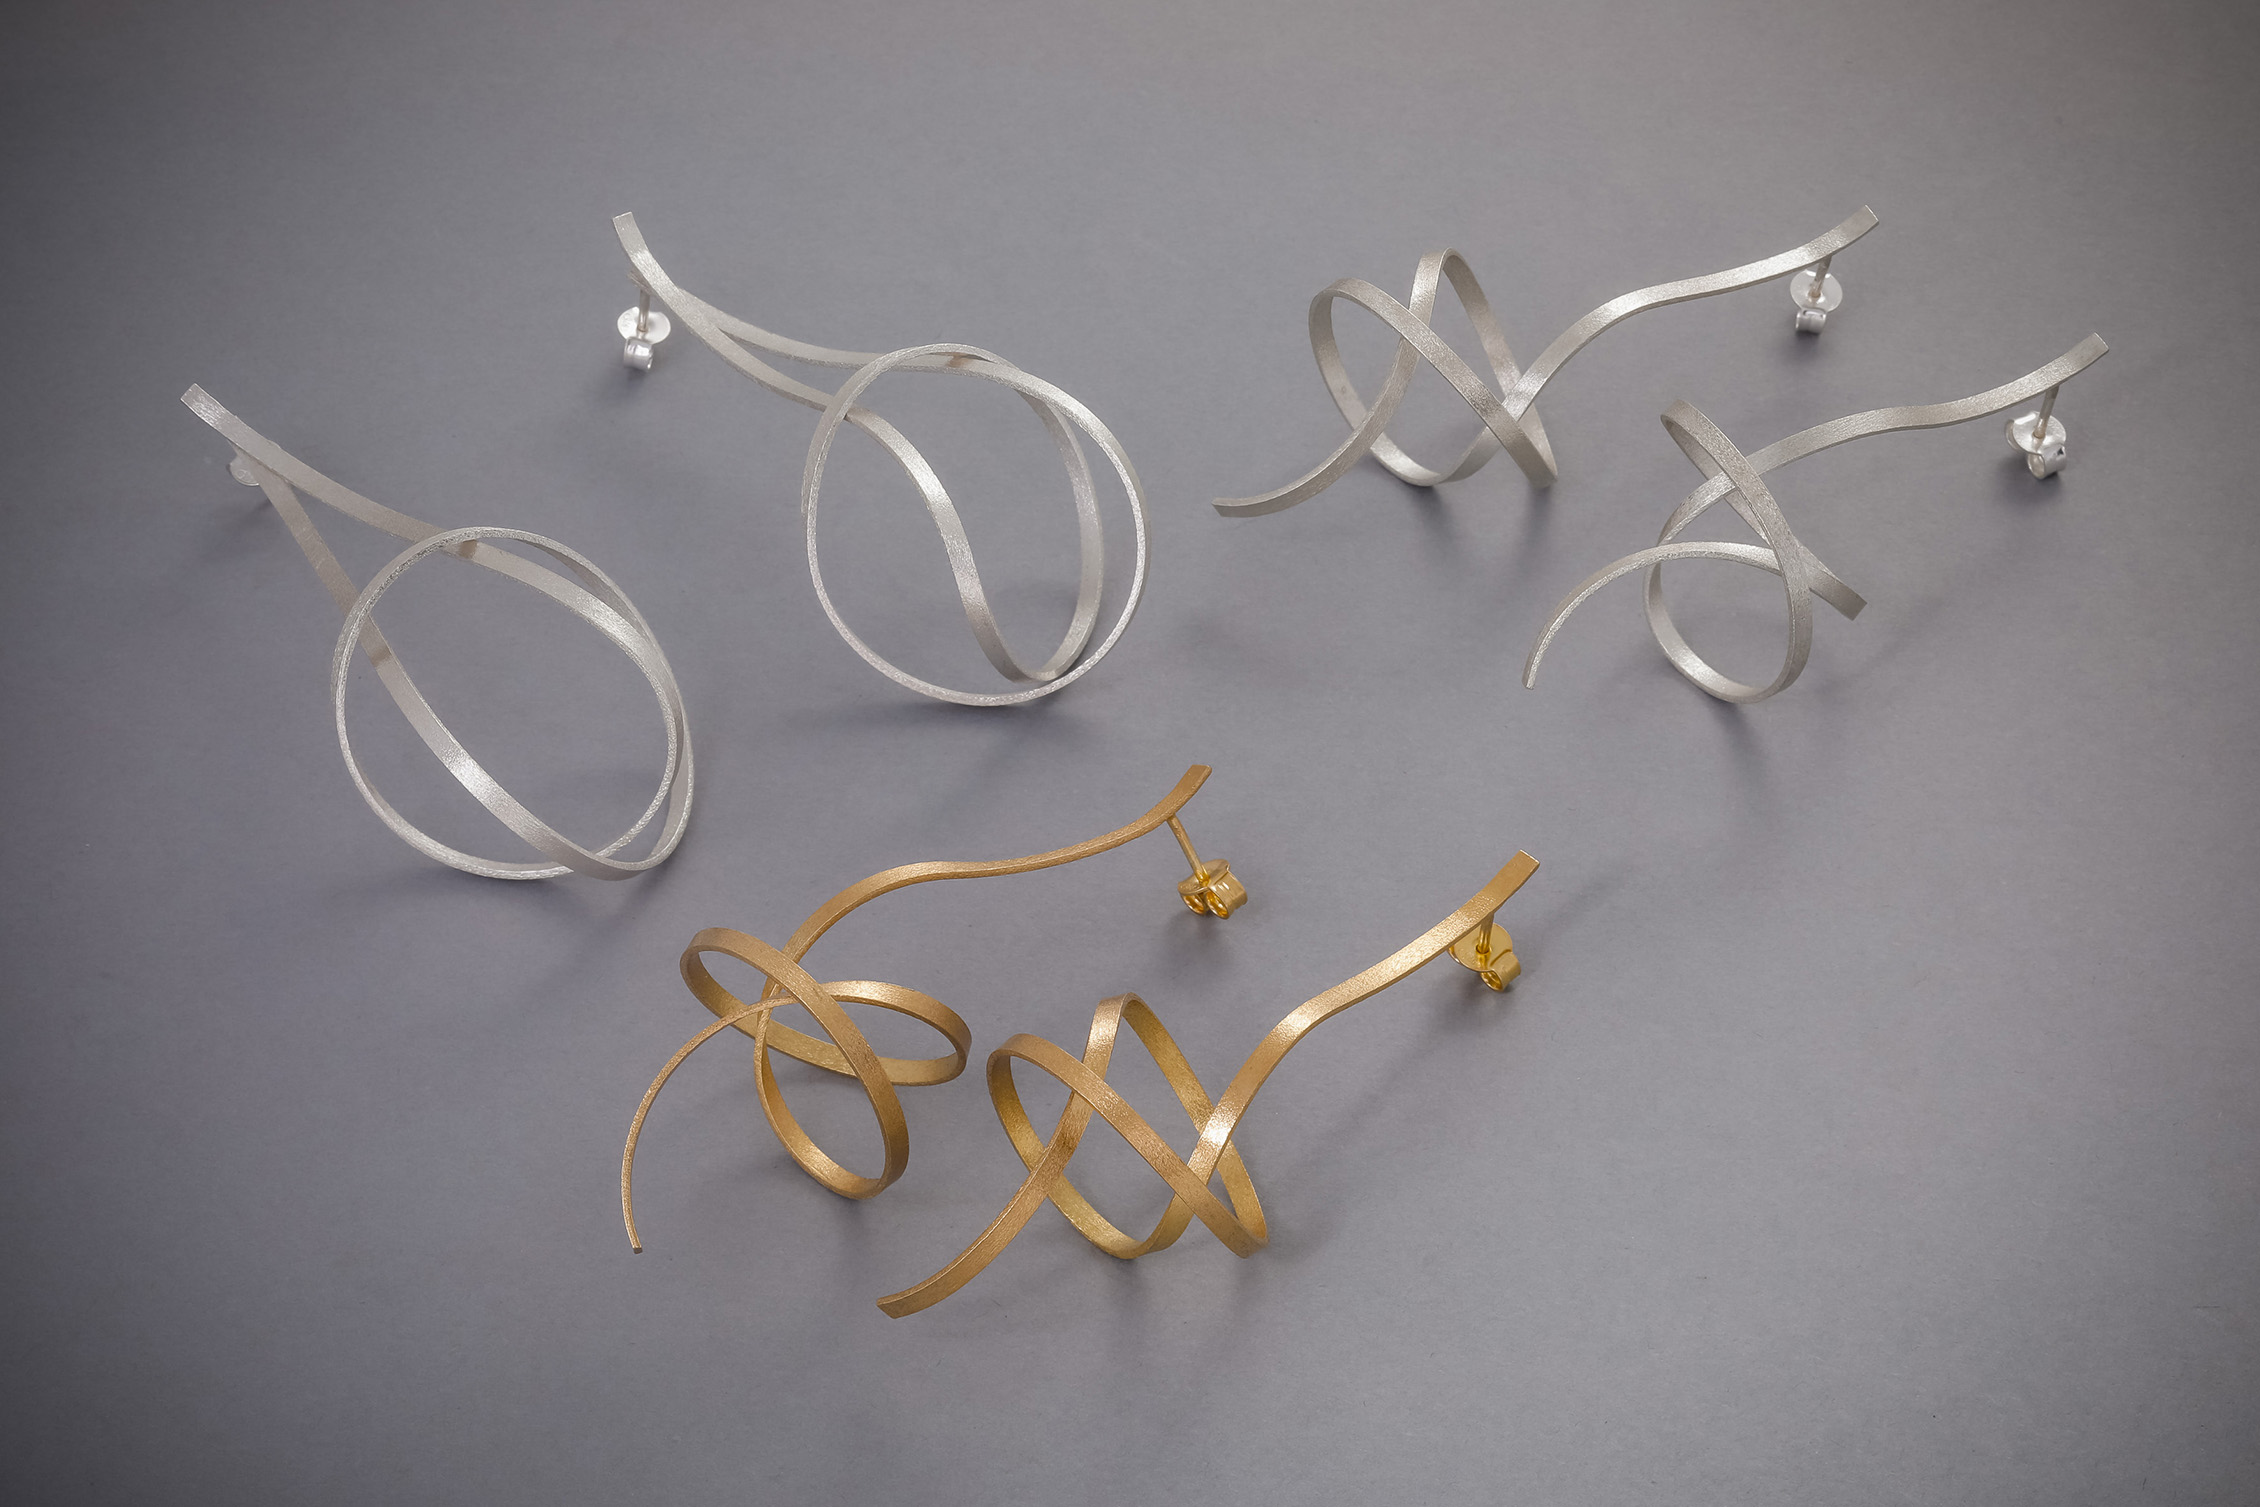 121 Spiralohrgehänge Silber, ab € 58,-, Silber vergoldet, ab € 64,-